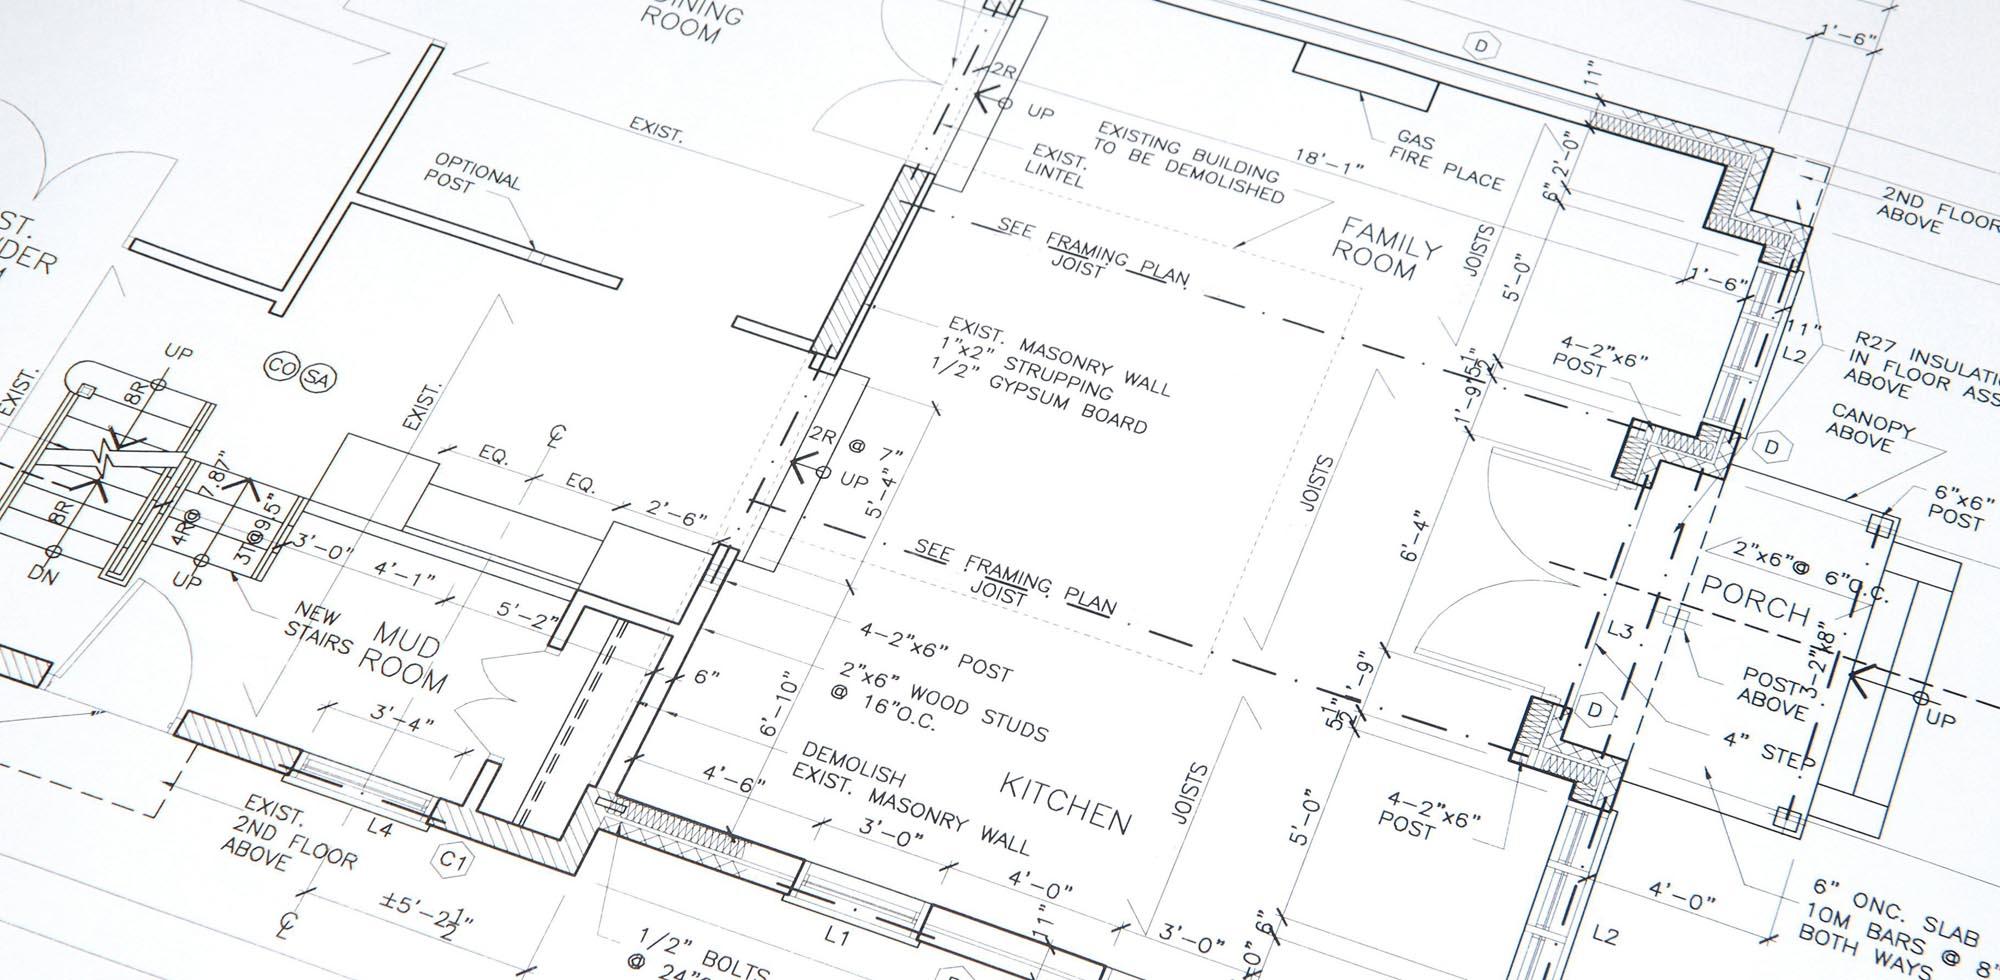 Architecture & Planning Permission